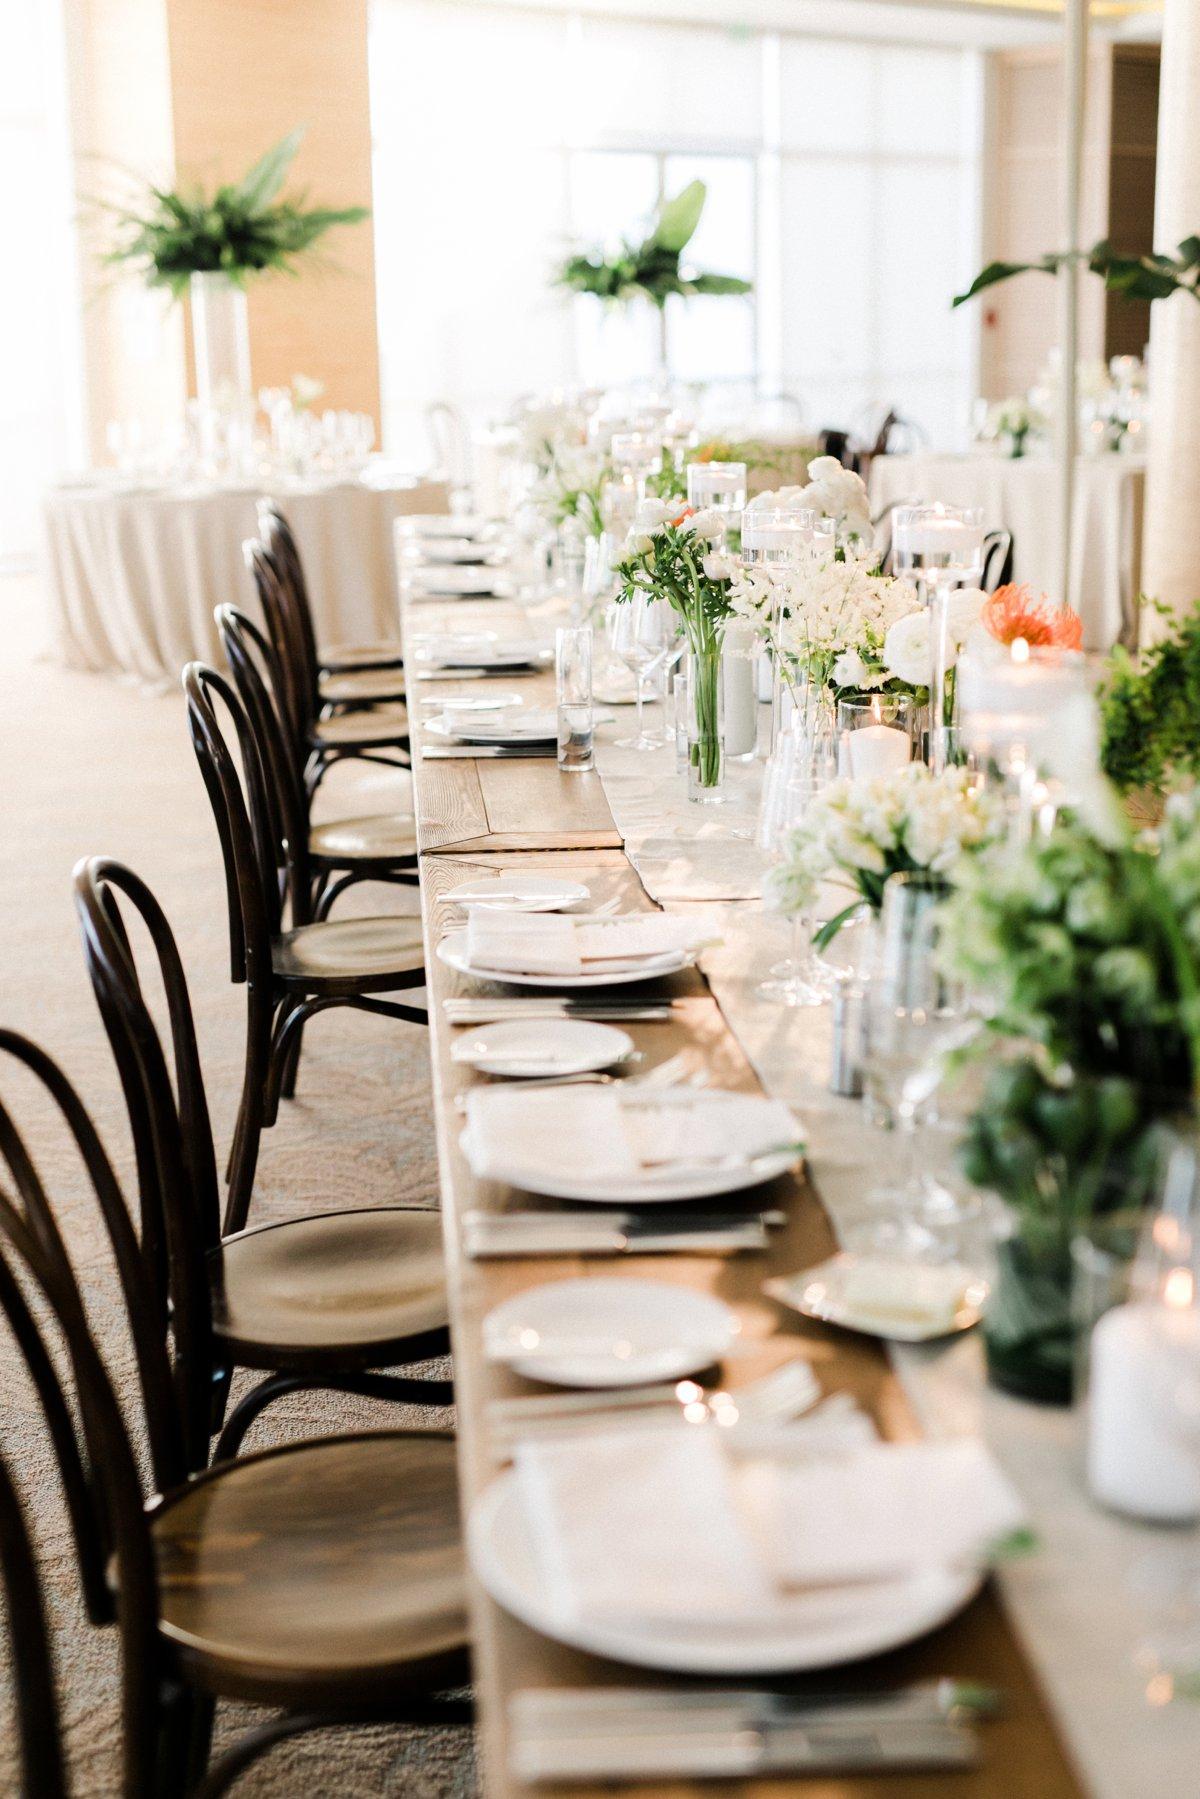 modern wedding tablescapes - photo by Anna Delores http://ruffledblog.com/chic-modern-wedding-at-four-seasons-santa-barbara